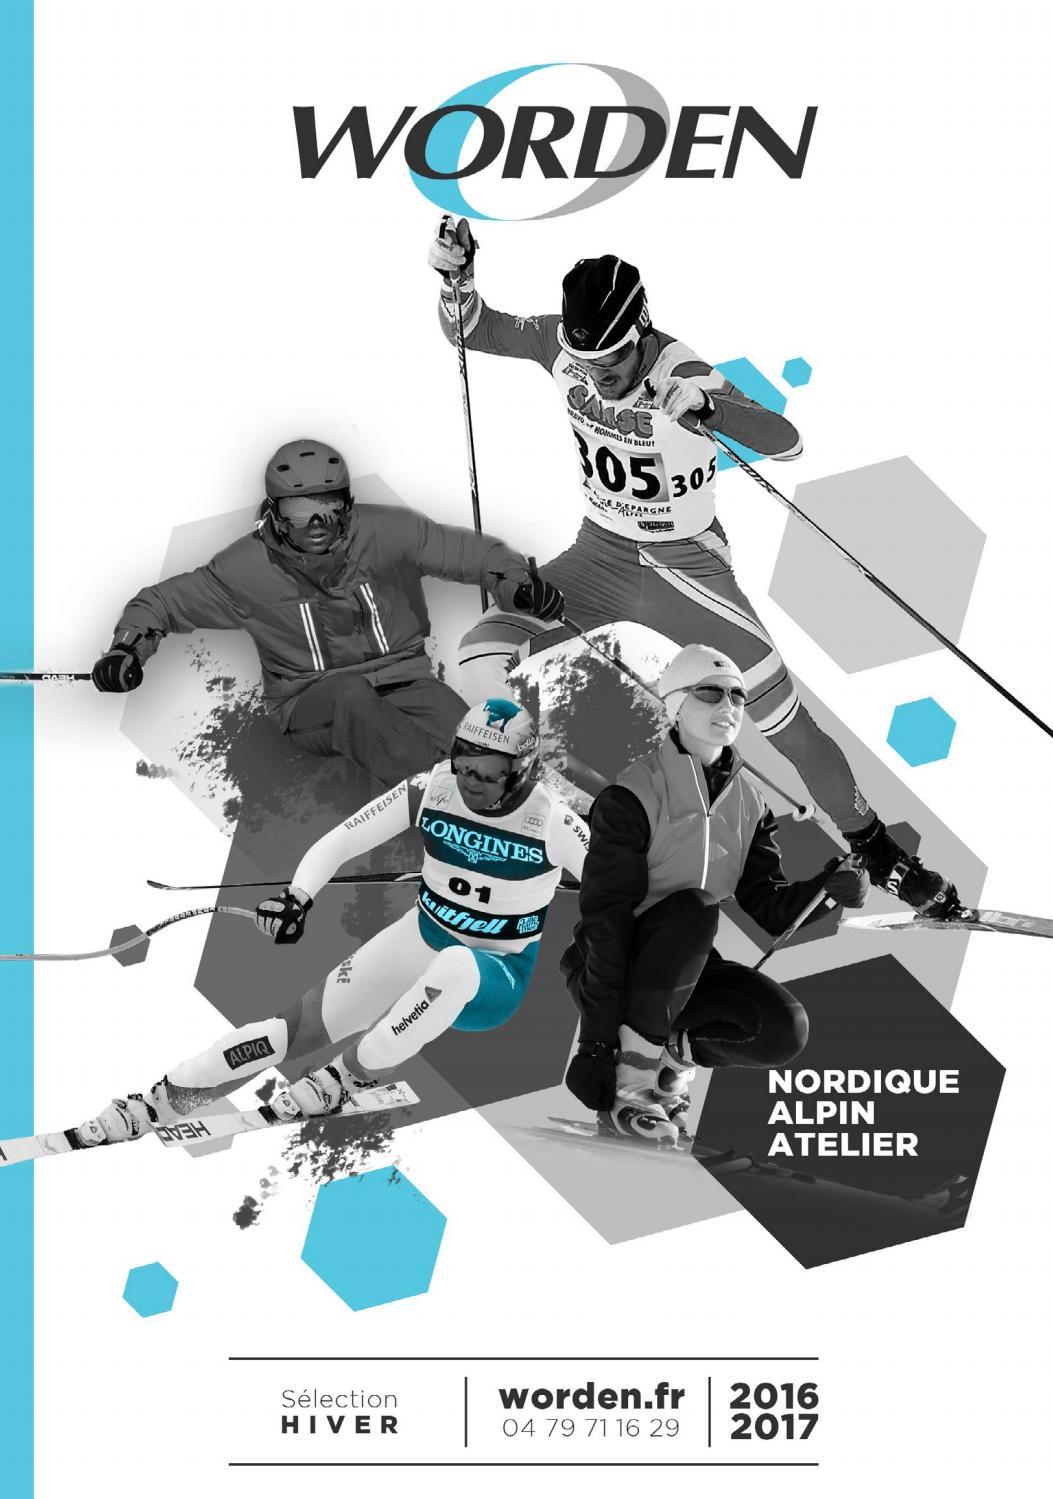 Lenz ski Kids 1.0 Sports d/'Hiver Enfants Chaussettes Ski Snowboard genou chaussette mérinos